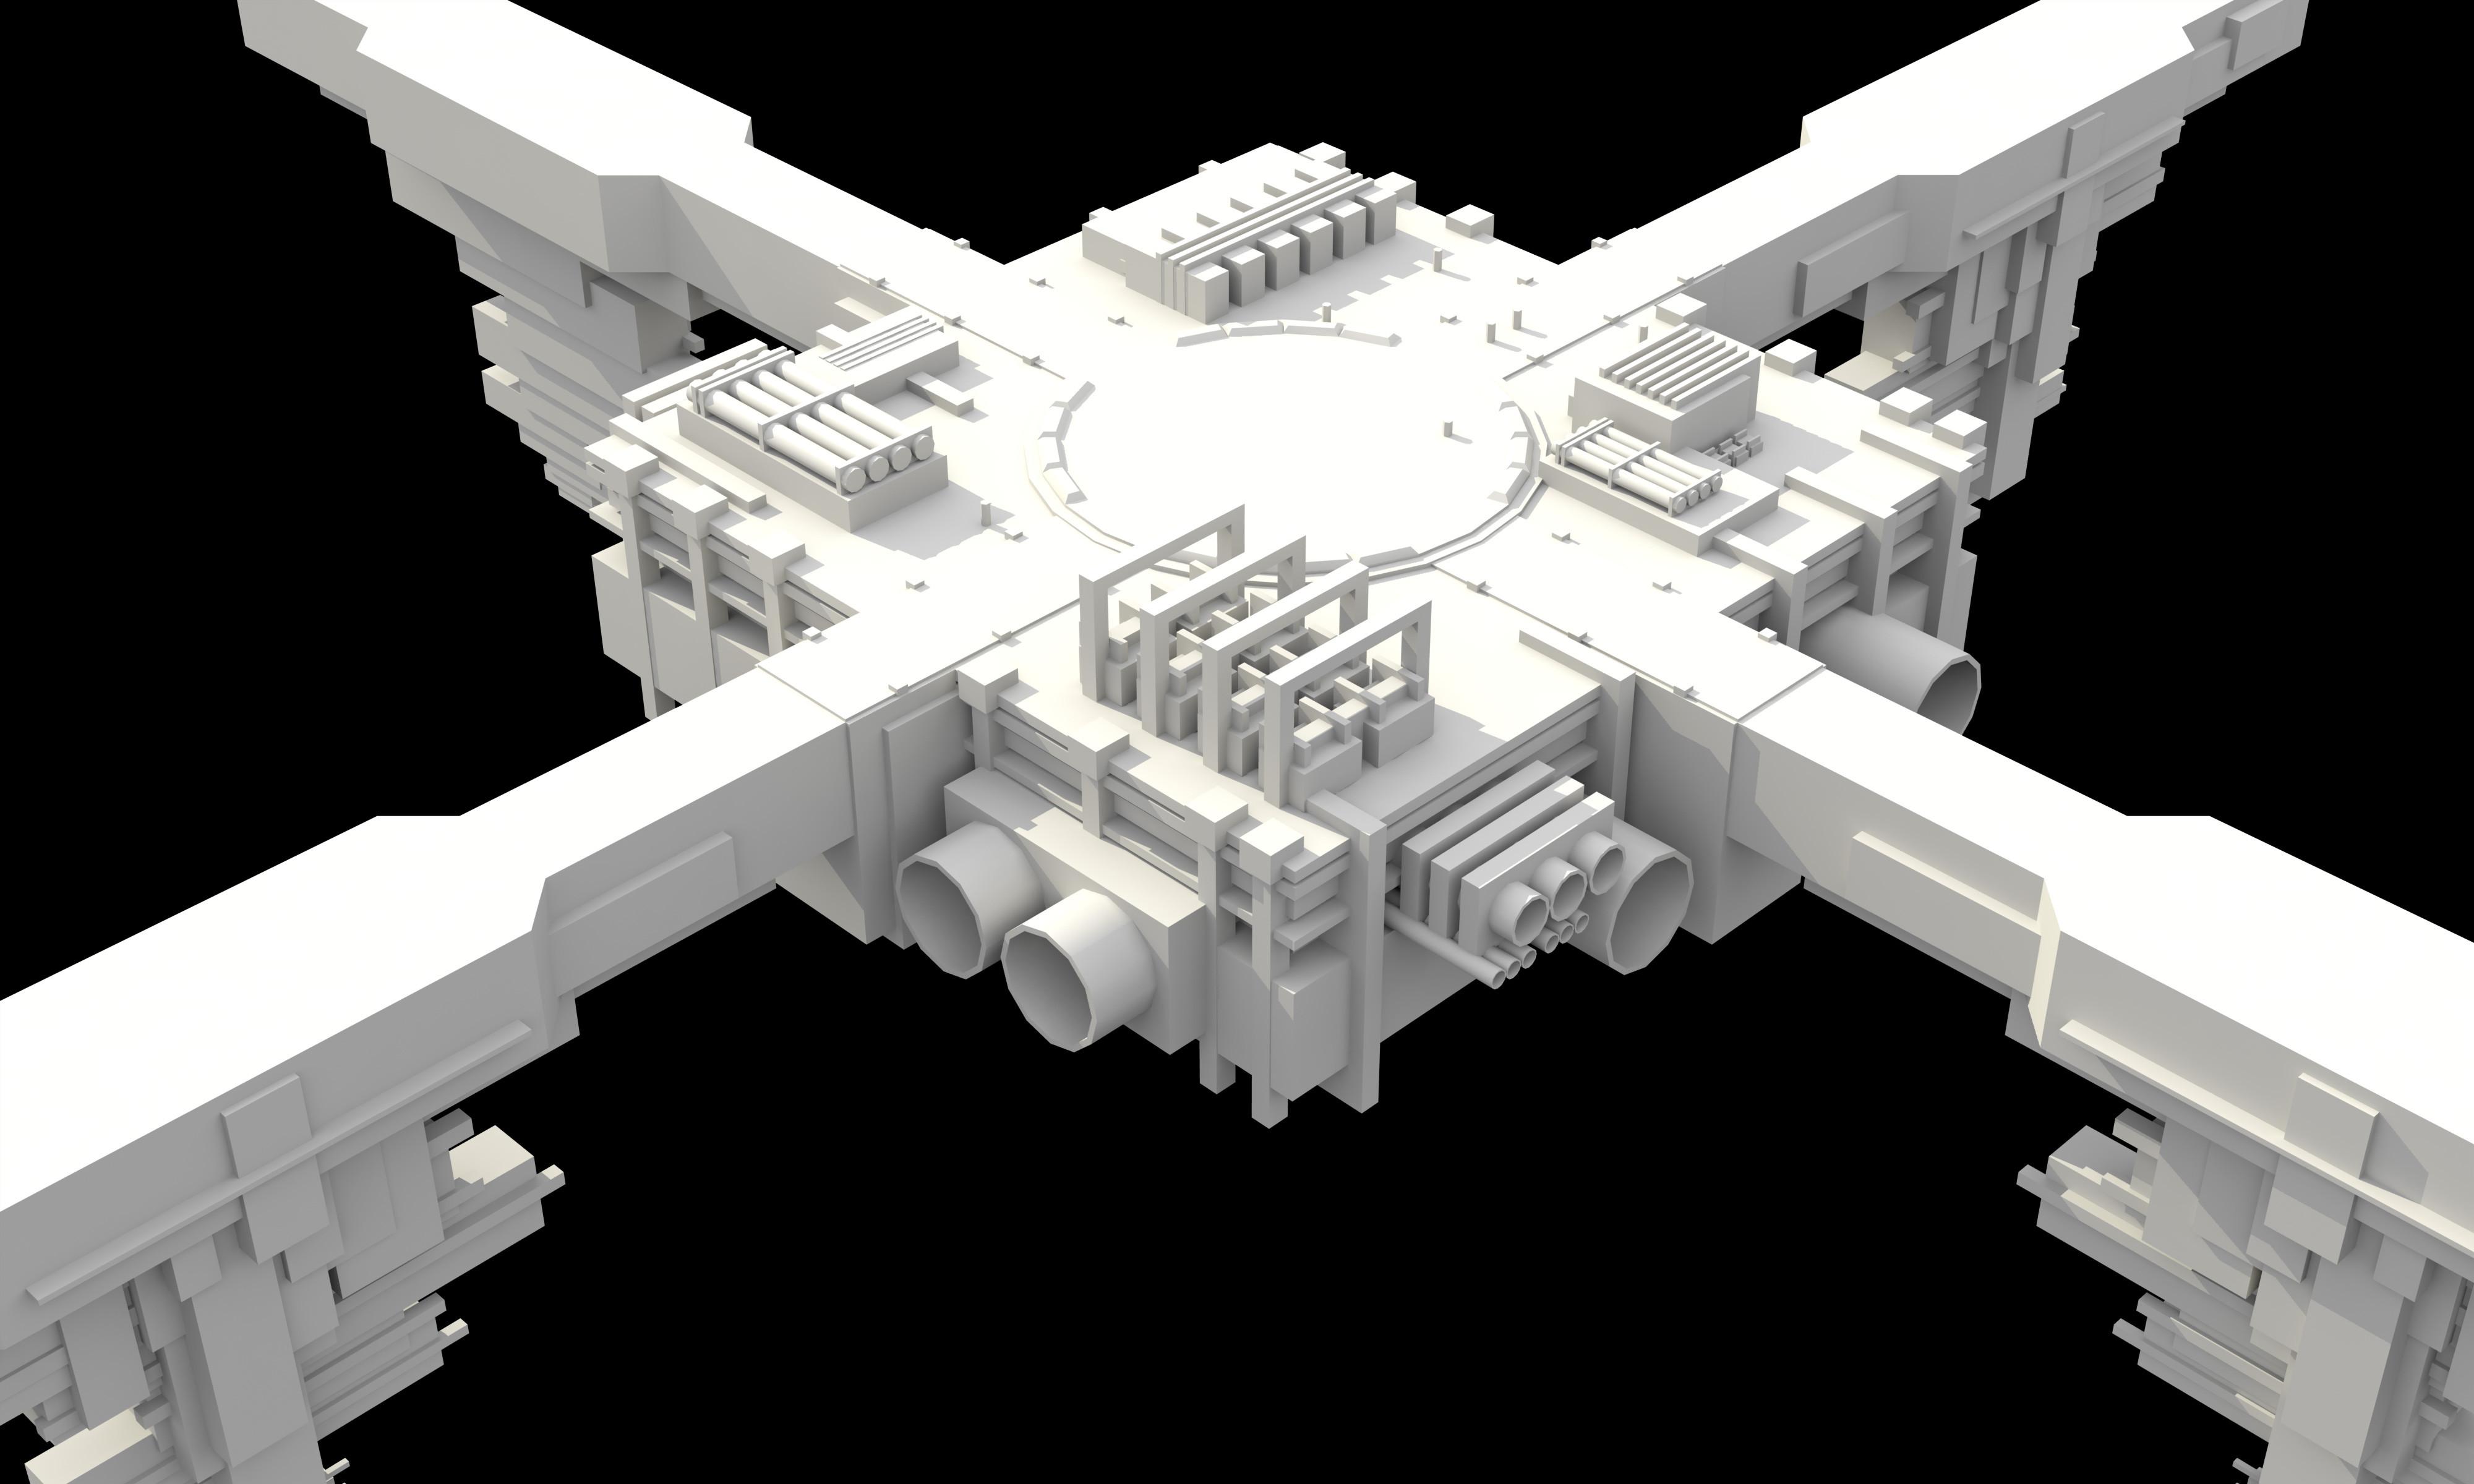 Maze Generation in Unreal Engine 4 - Nylira